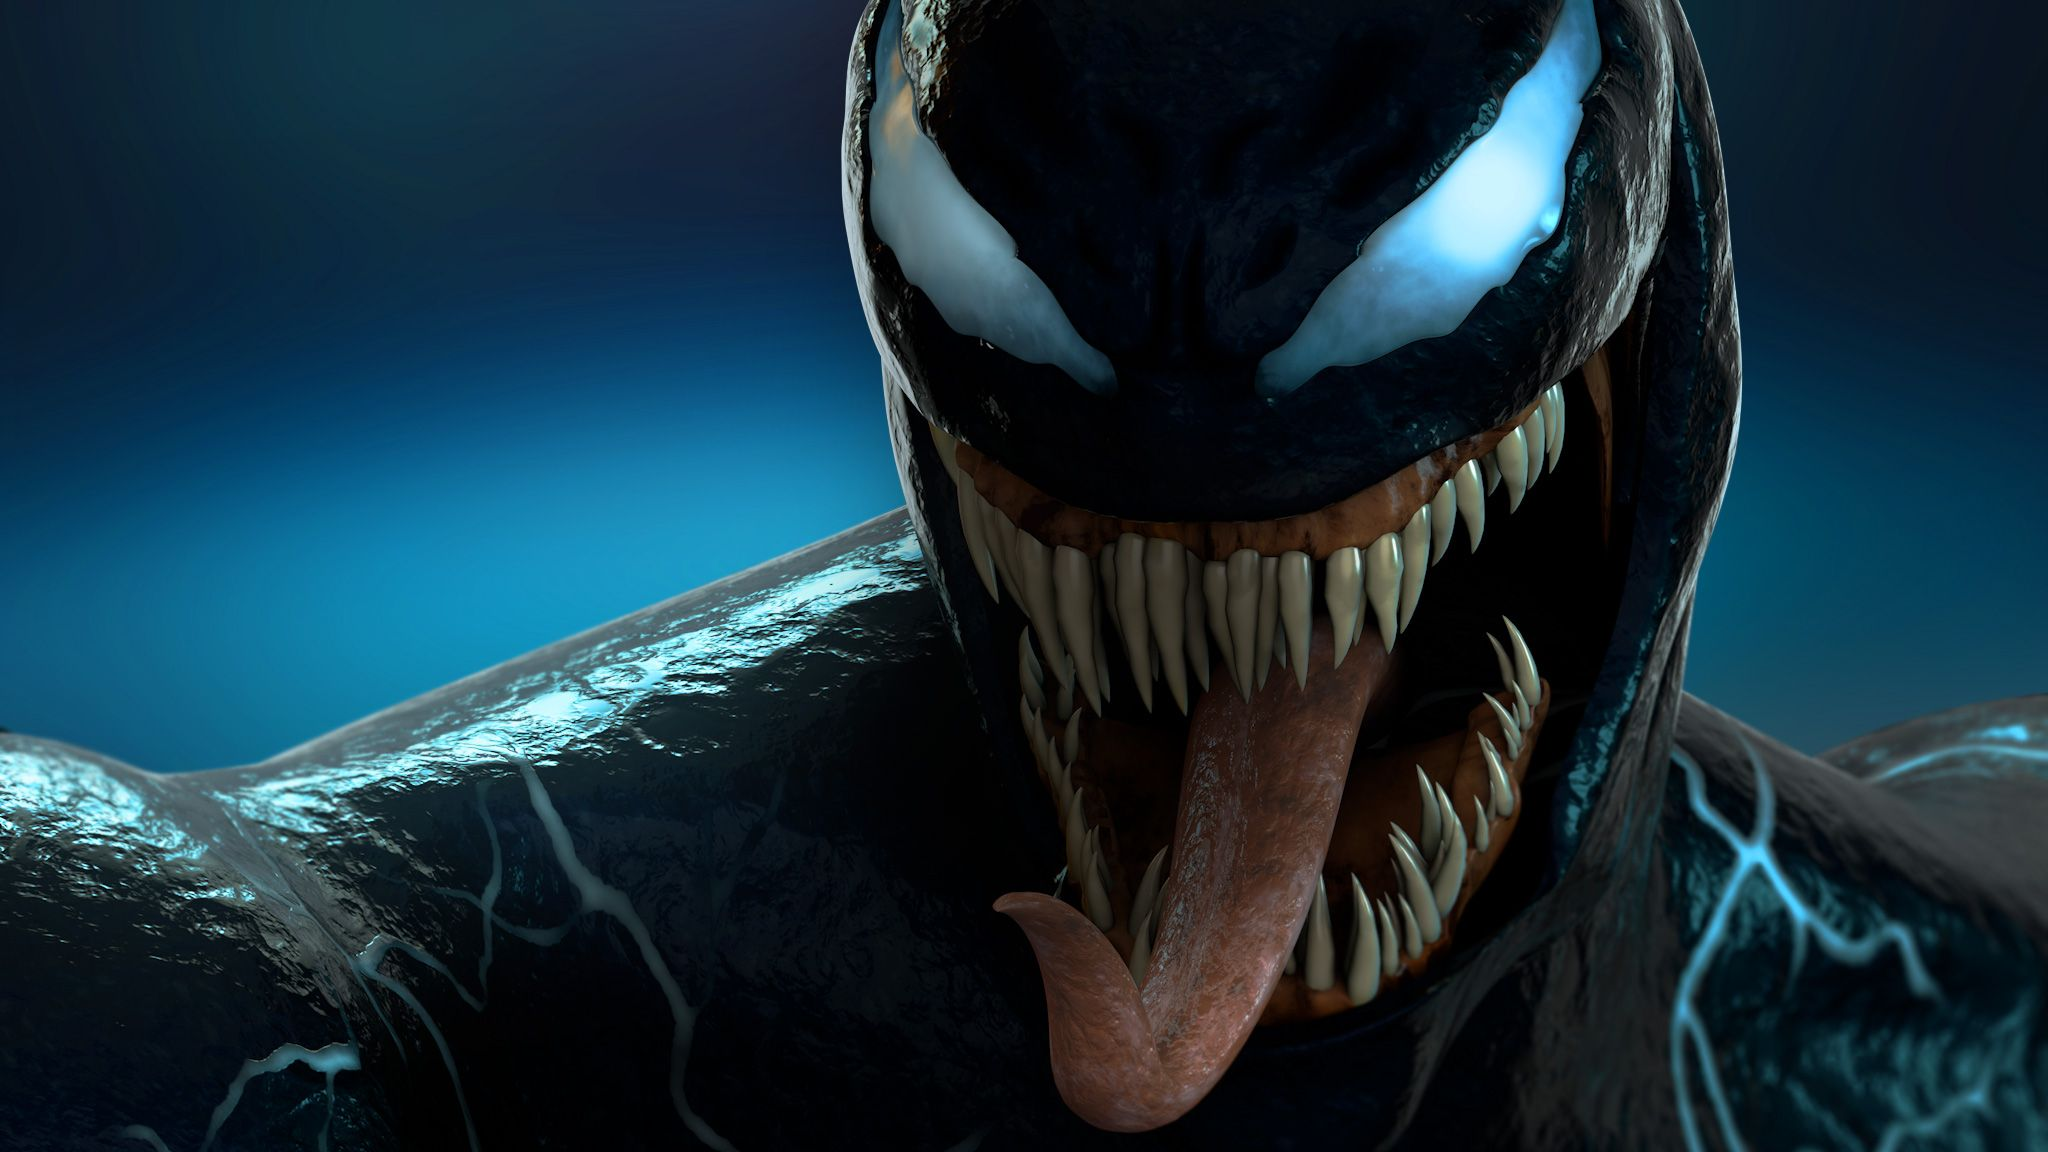 Venom 3d Wallpapers Top Free Venom 3d Backgrounds Wallpaperaccess